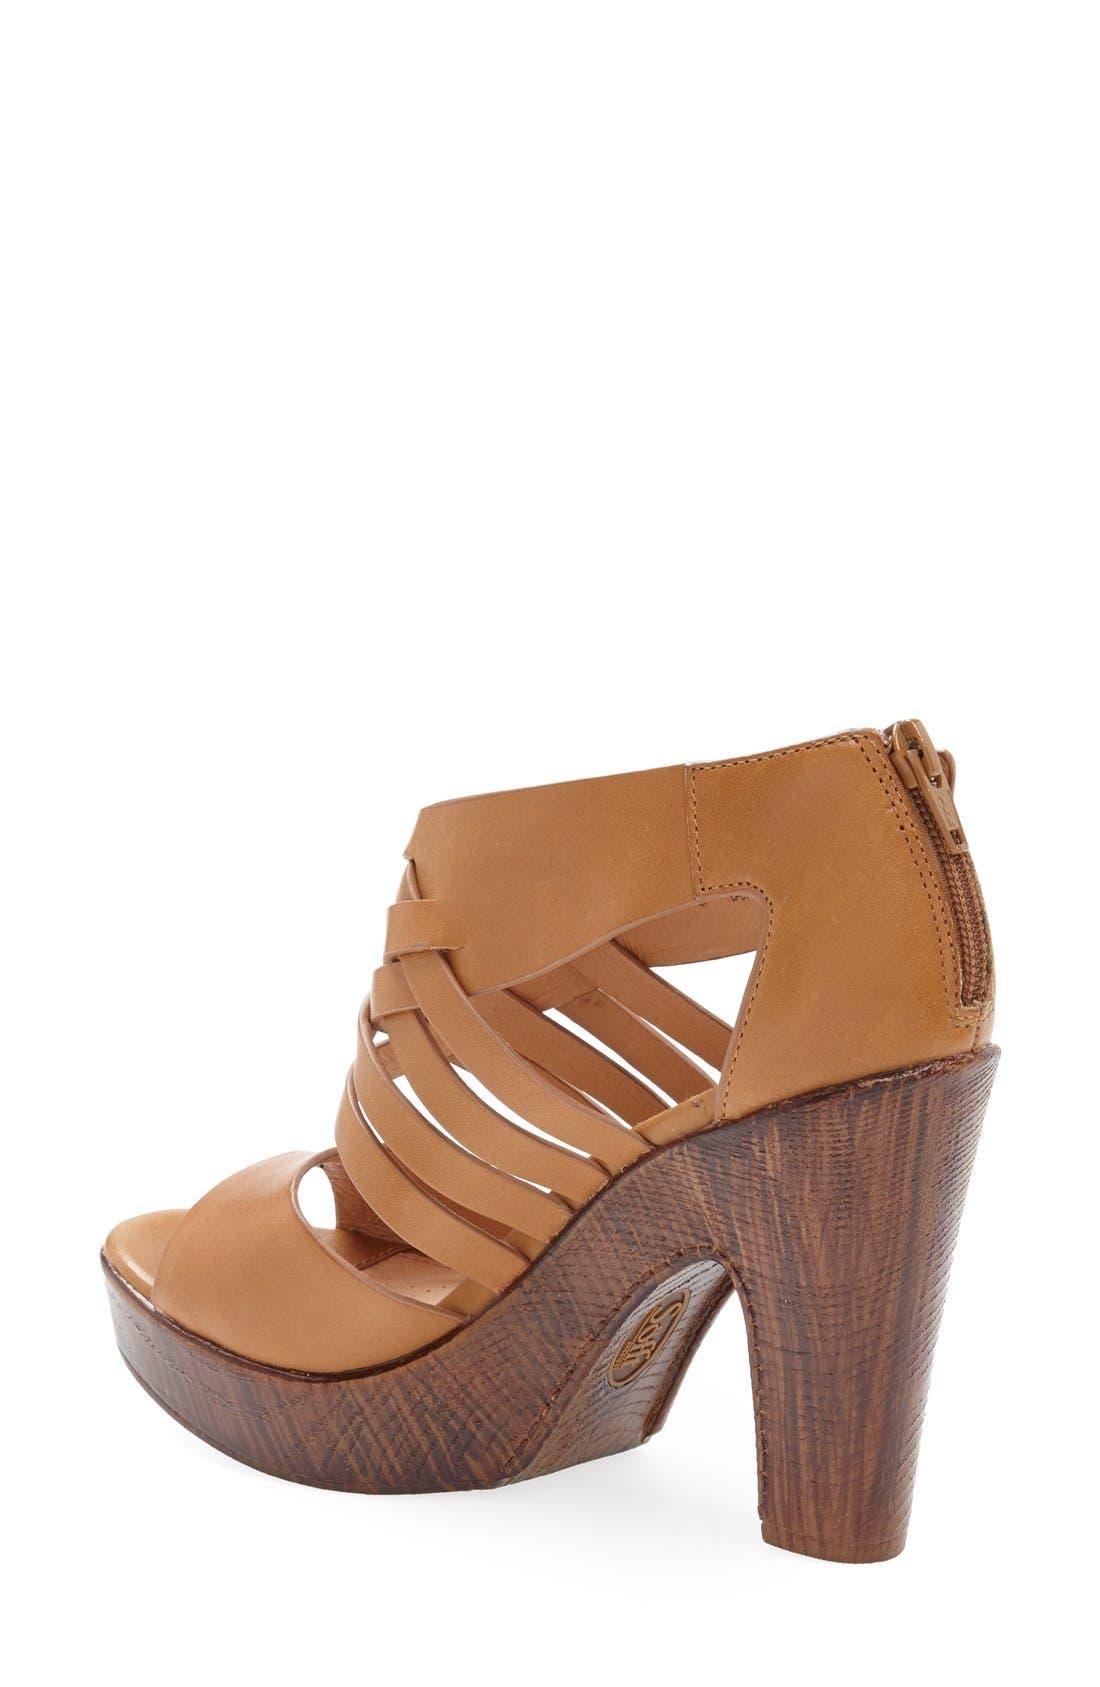 'Ohanna' Leather Sandal,                             Alternate thumbnail 2, color,                             Luggage